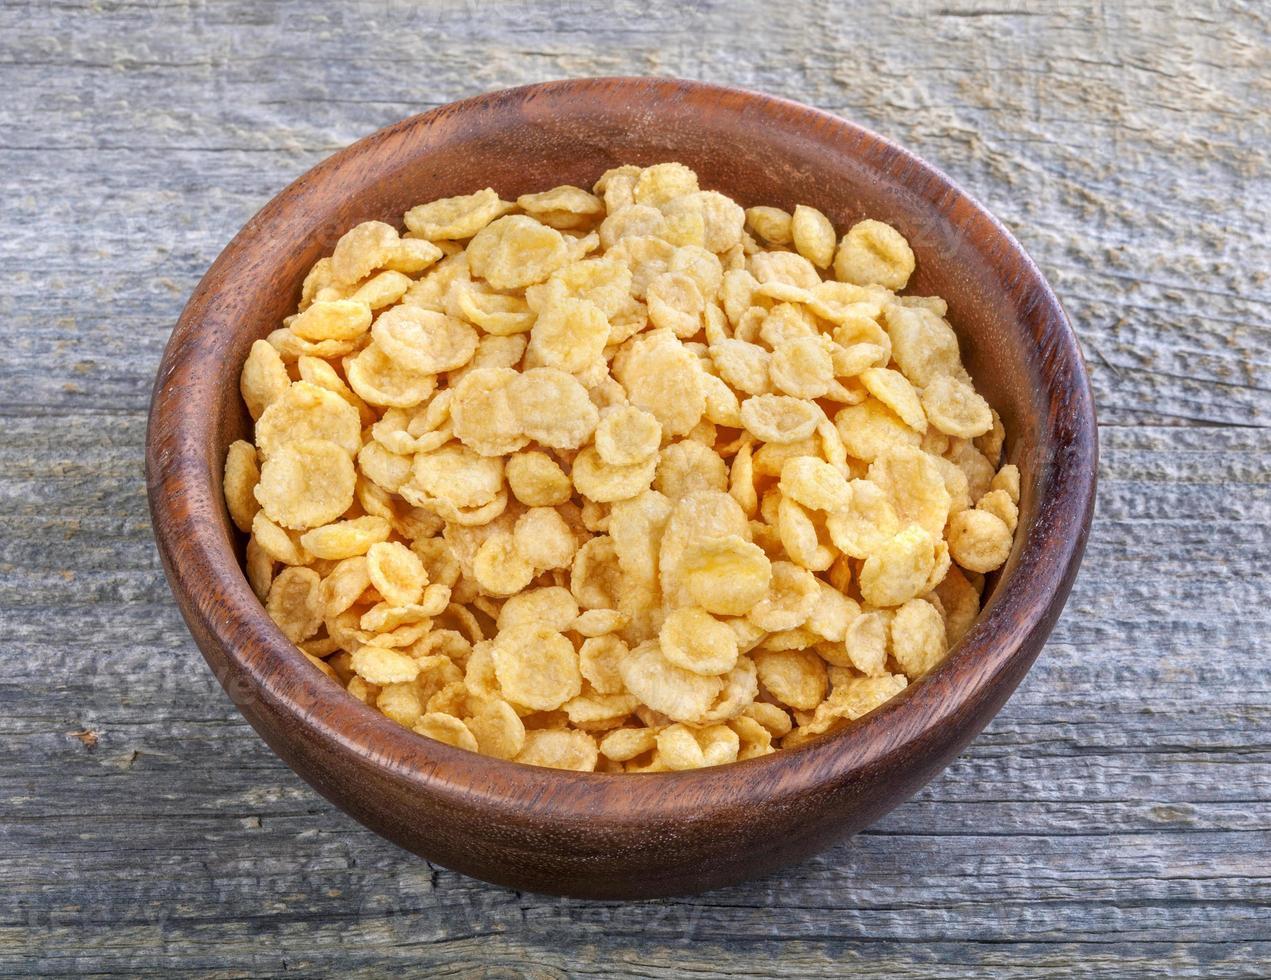 Cornflakes photo